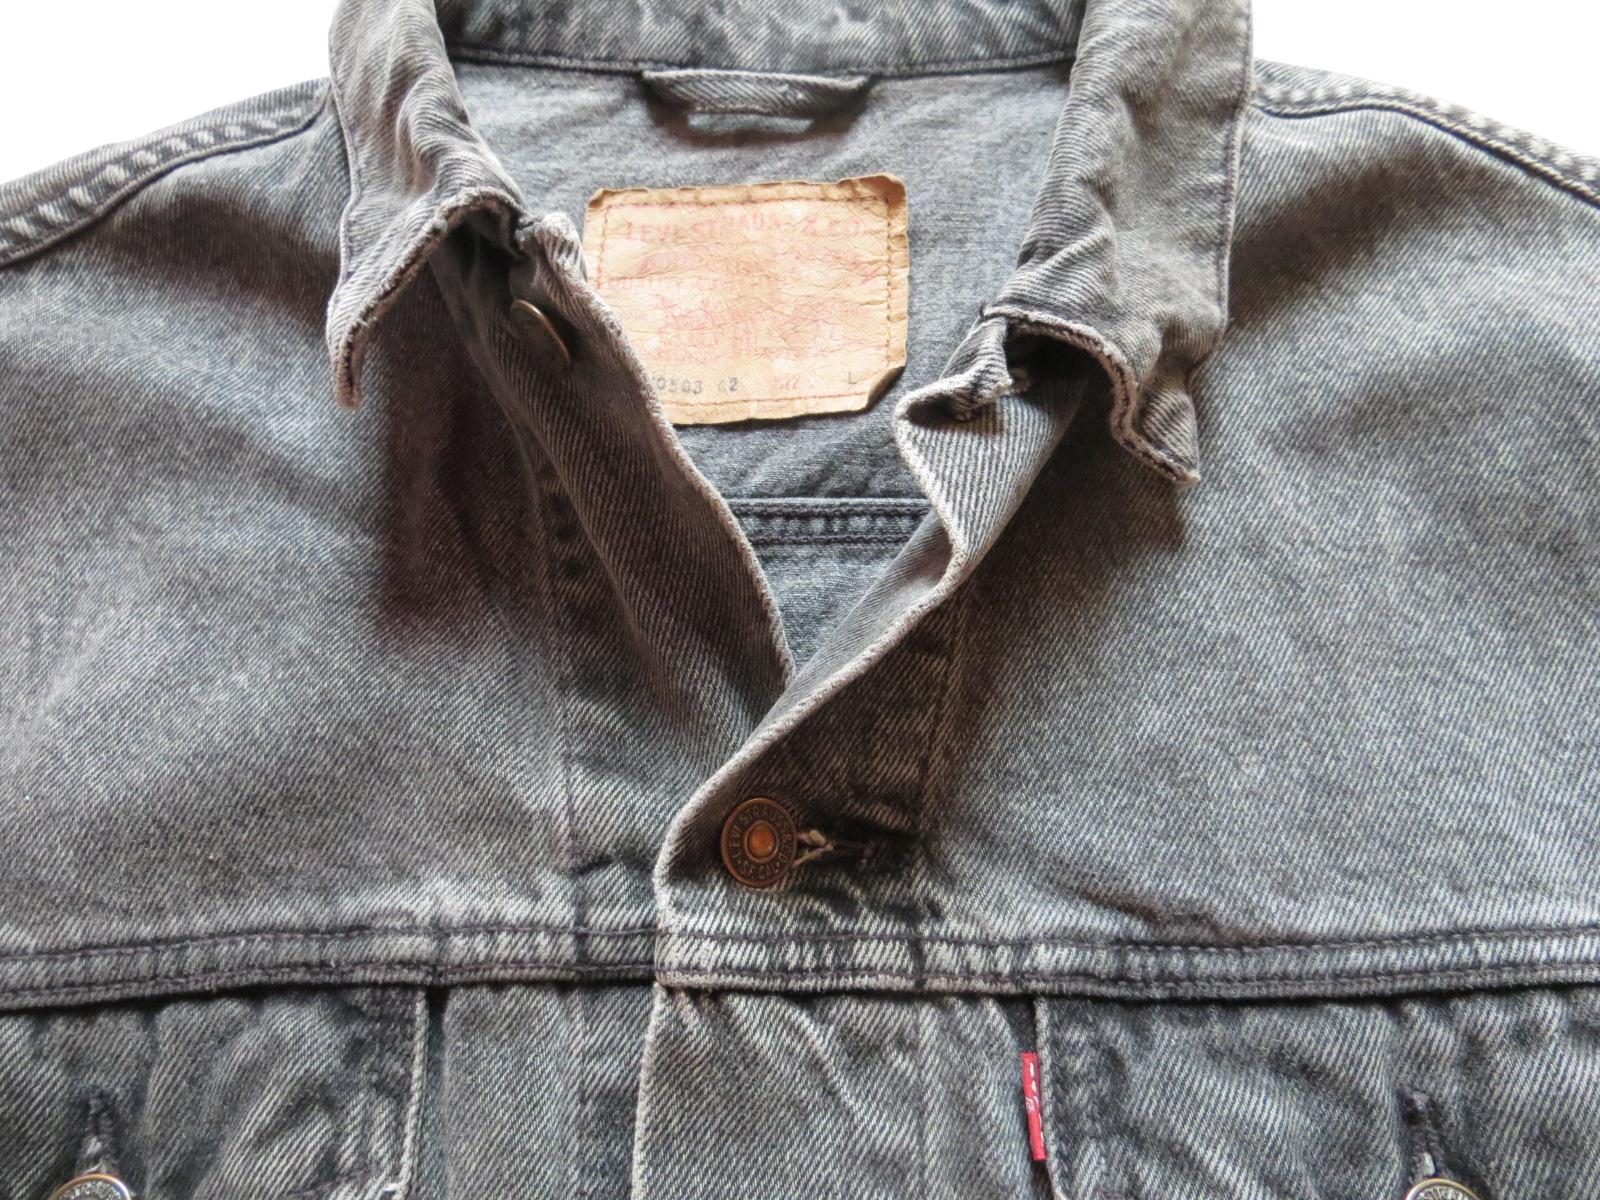 Details zu Levi's Biker Jacke, Jeansjacke Gr. L, grau ! Lot 70503 Vintage Denim, KULT !